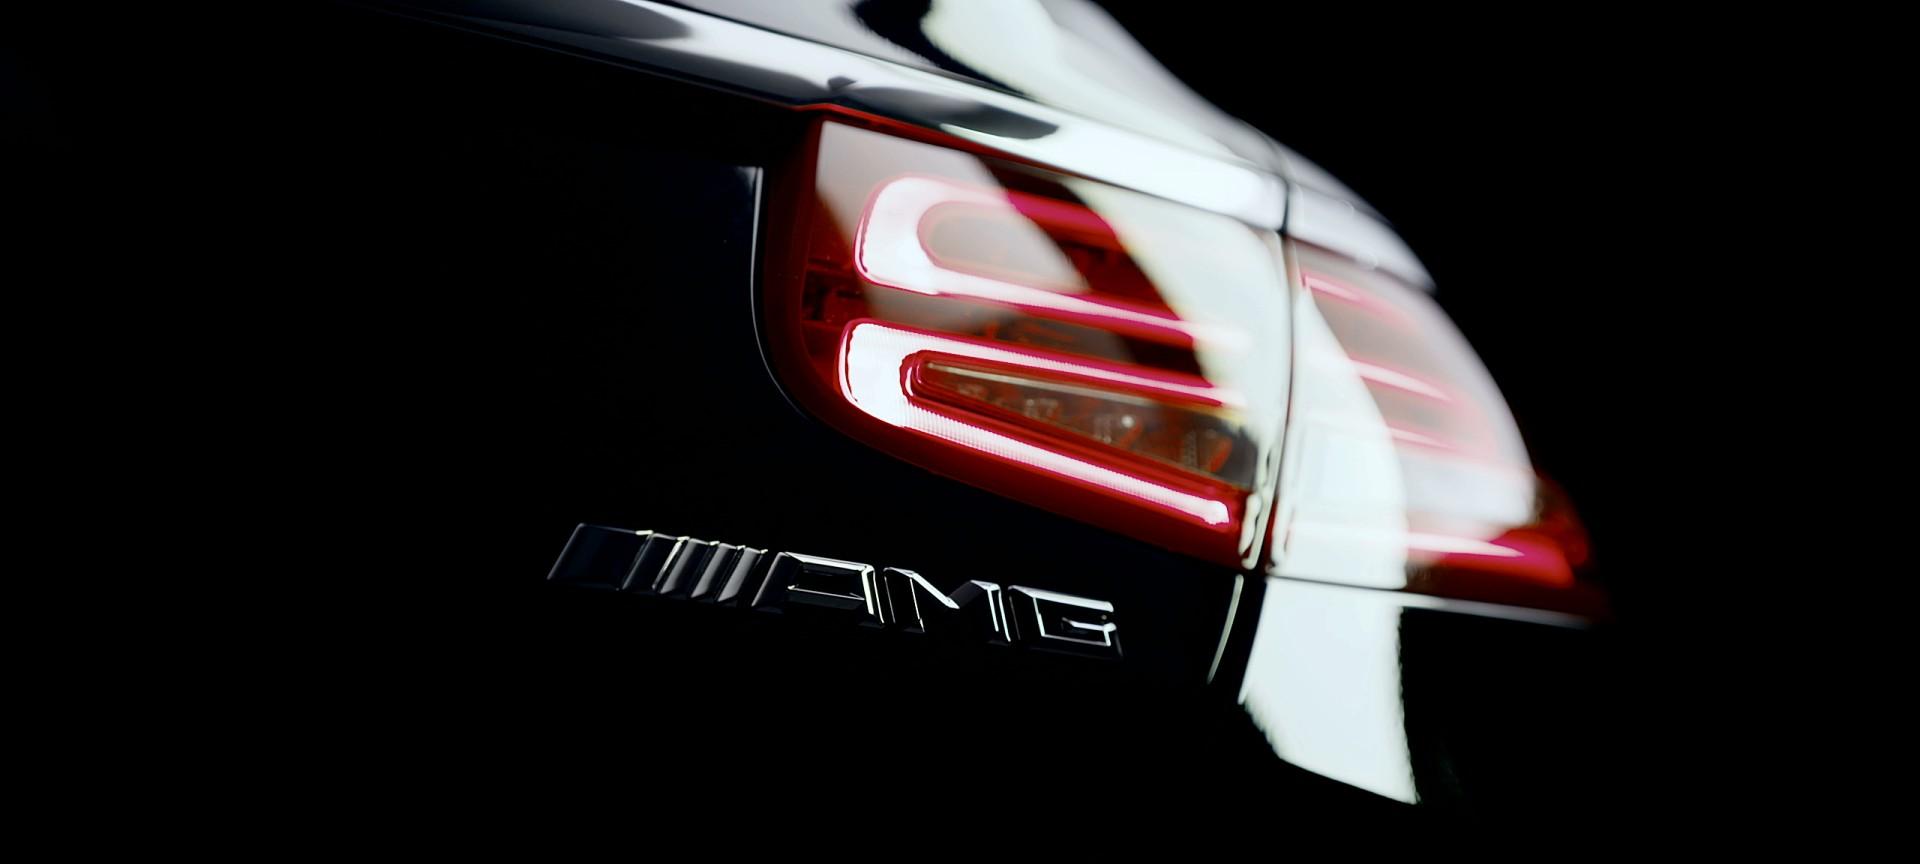 monomango Mercedes-Benz AMG S 65